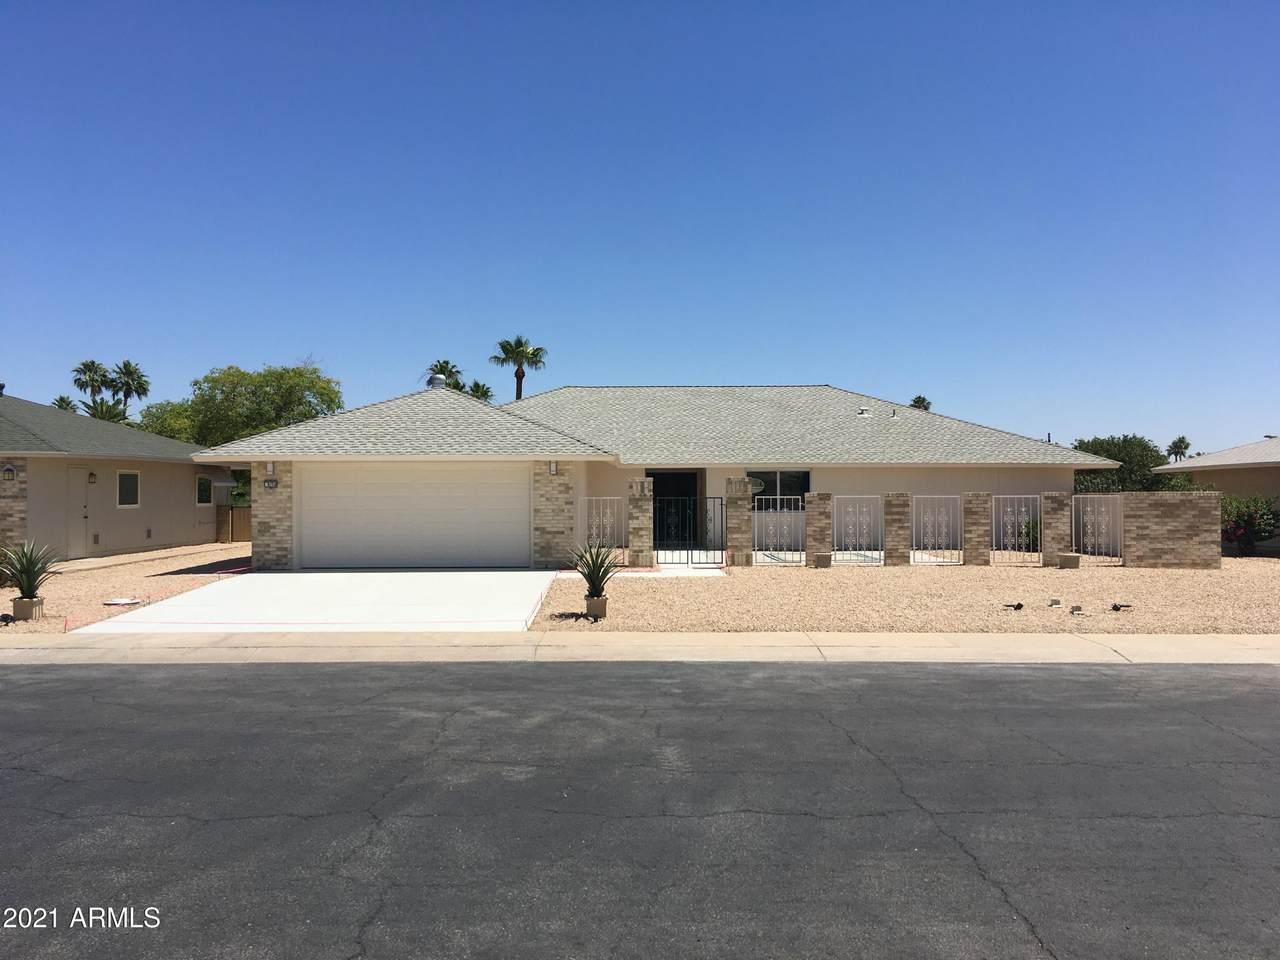 9750 Desert Hills Drive - Photo 1